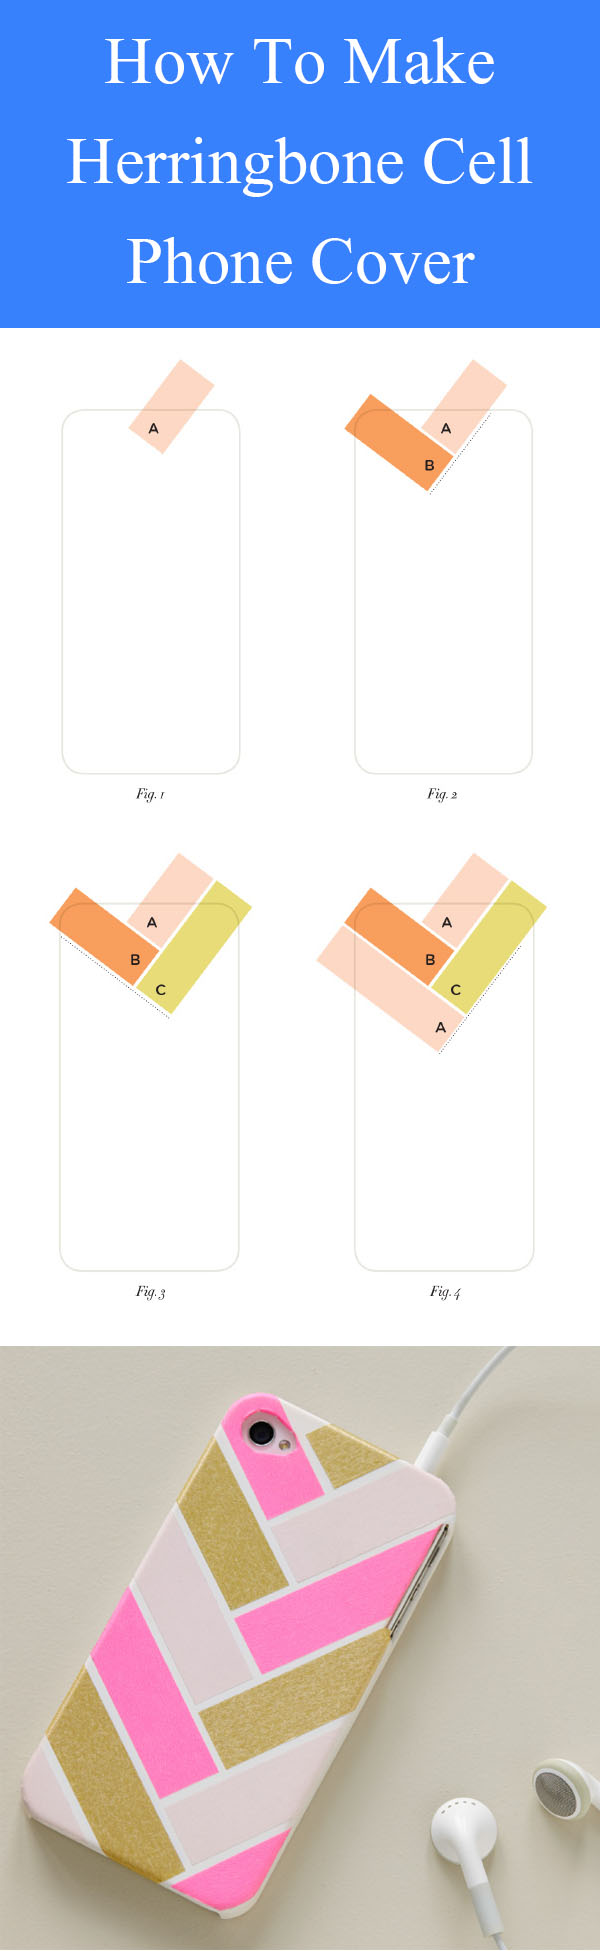 DIY Herringbone Cell Phone Cover